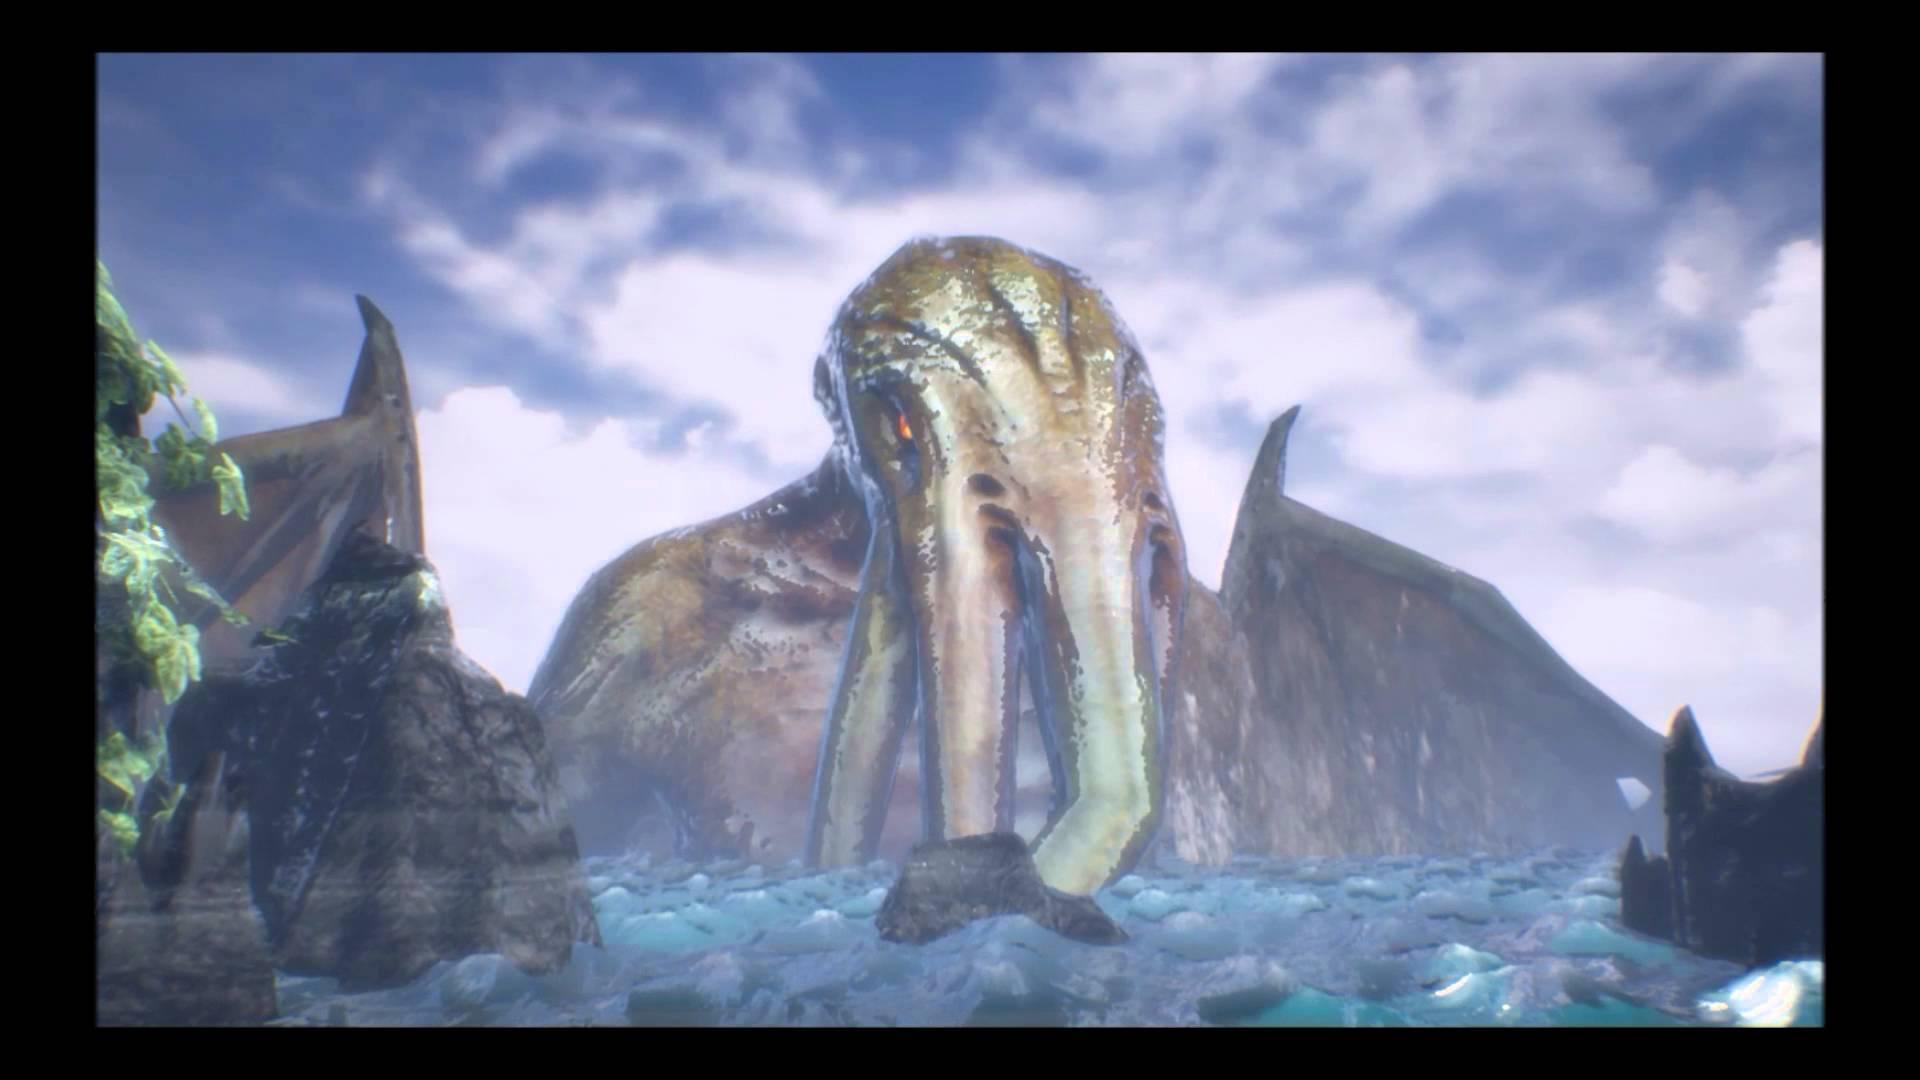 Lovecrafts AT THE MOUNTAINS OF MADNESS wird zum Computerspiel